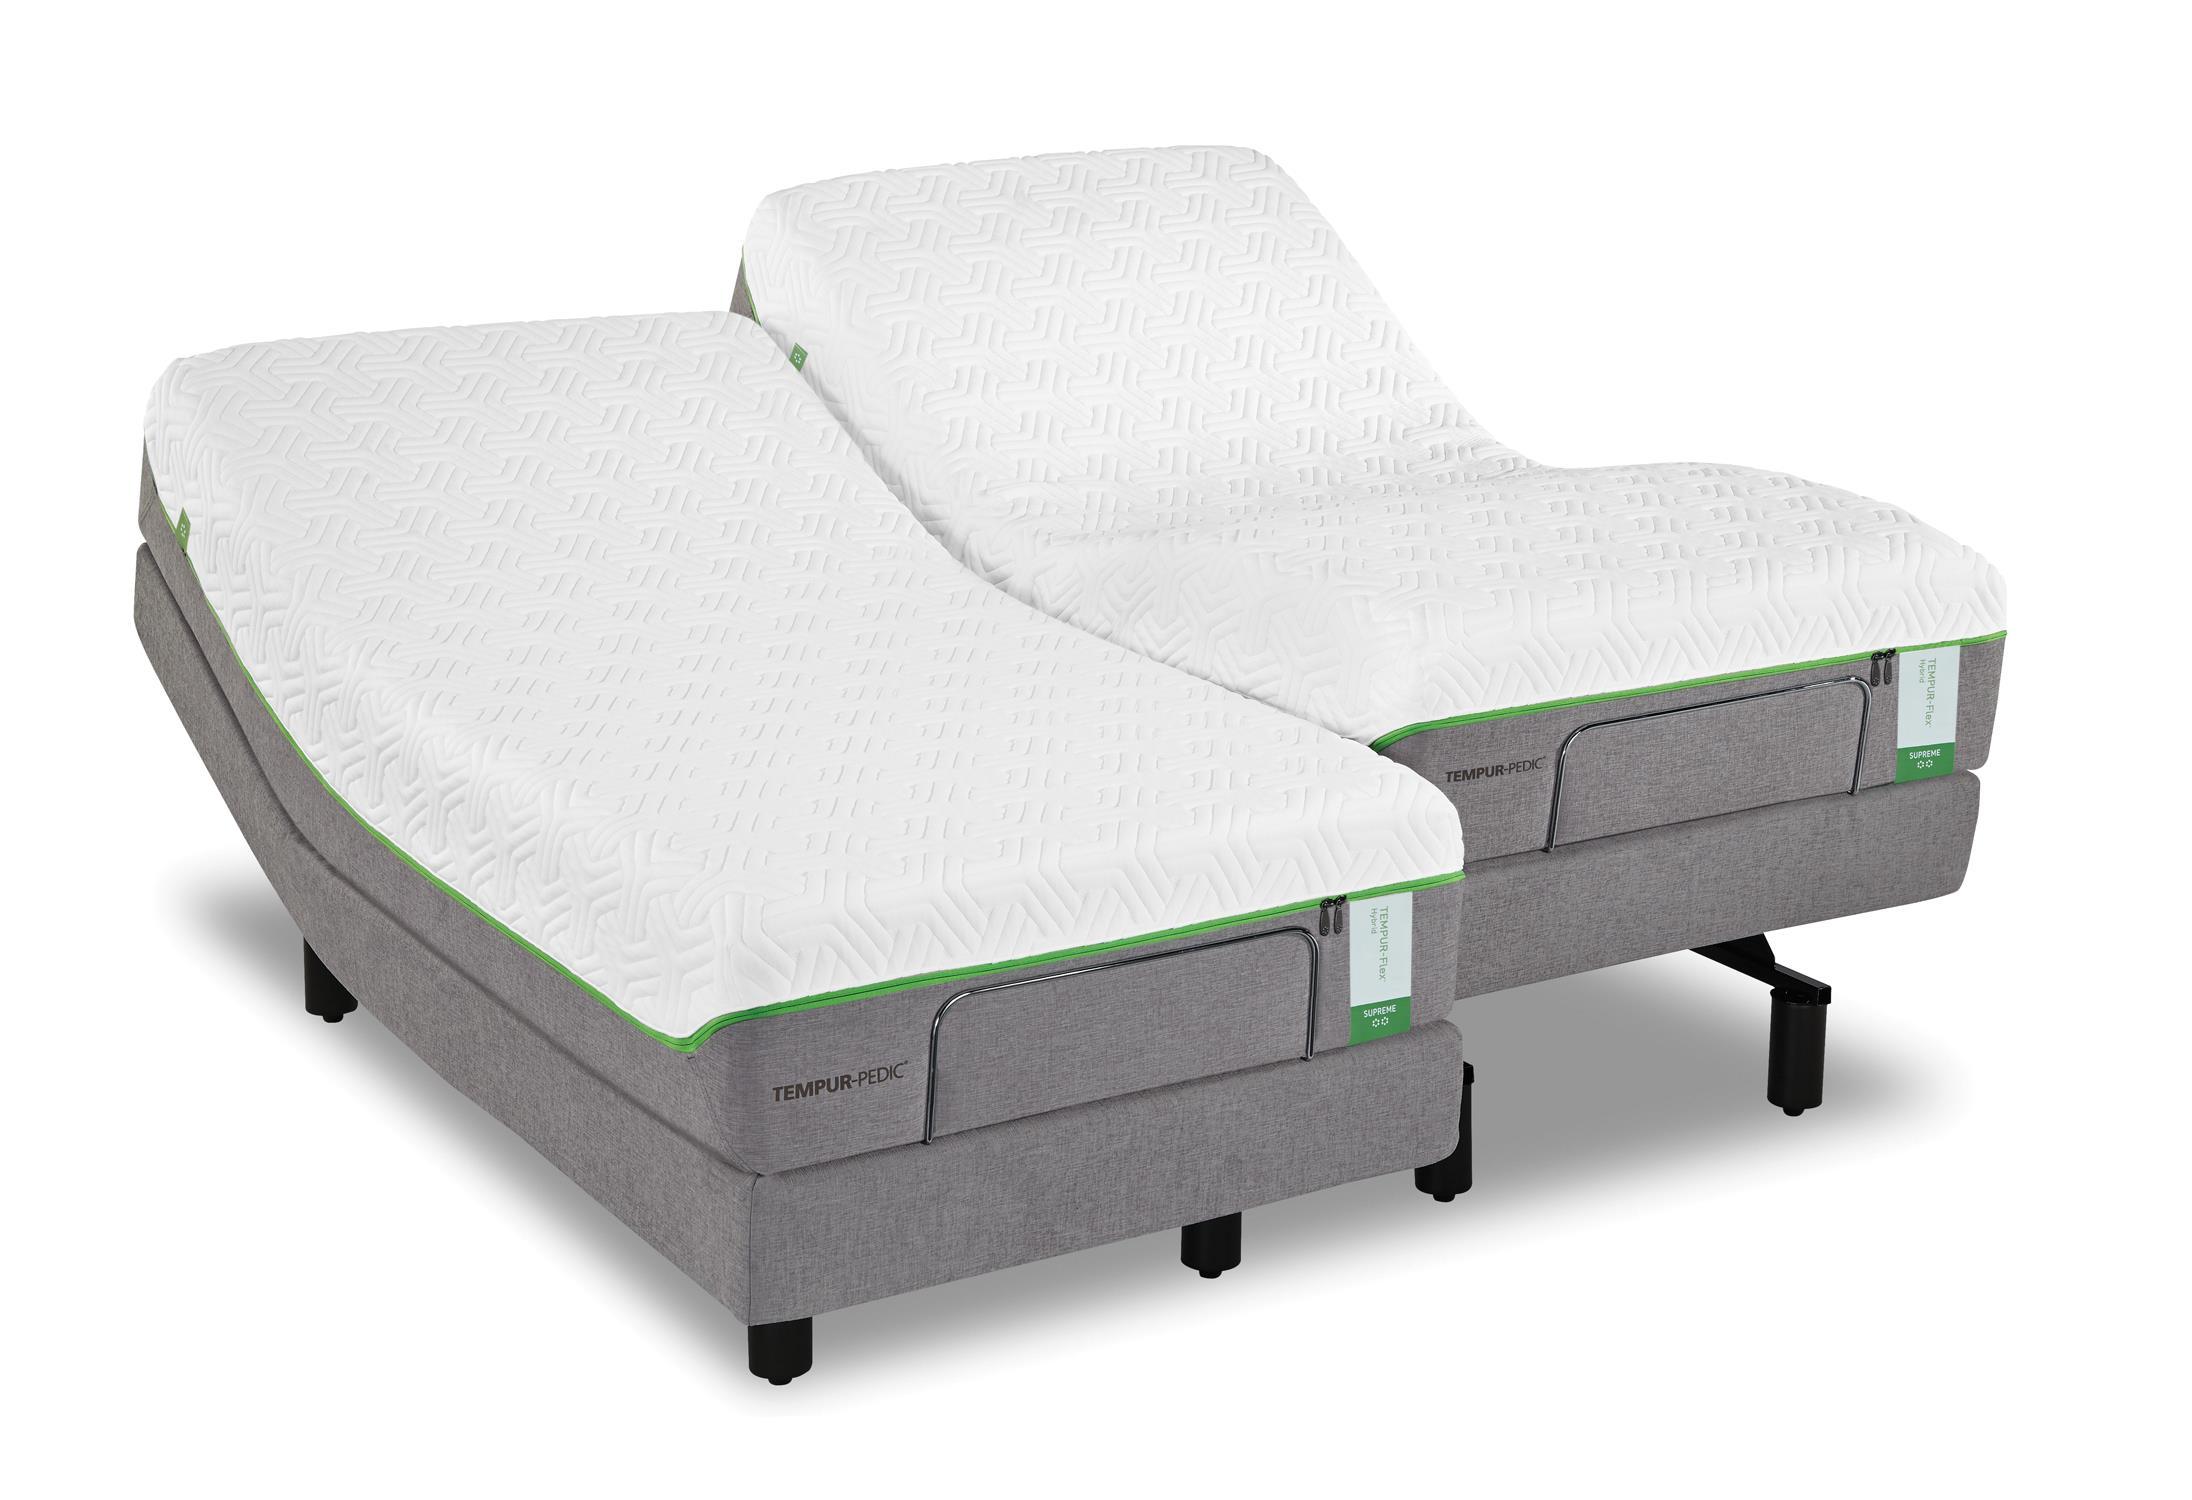 Tempur-Pedic® TEMPUR-Flex Prima Twin Extra Long Medium Firm Mattress Set - Item Number: 10115220+25289220